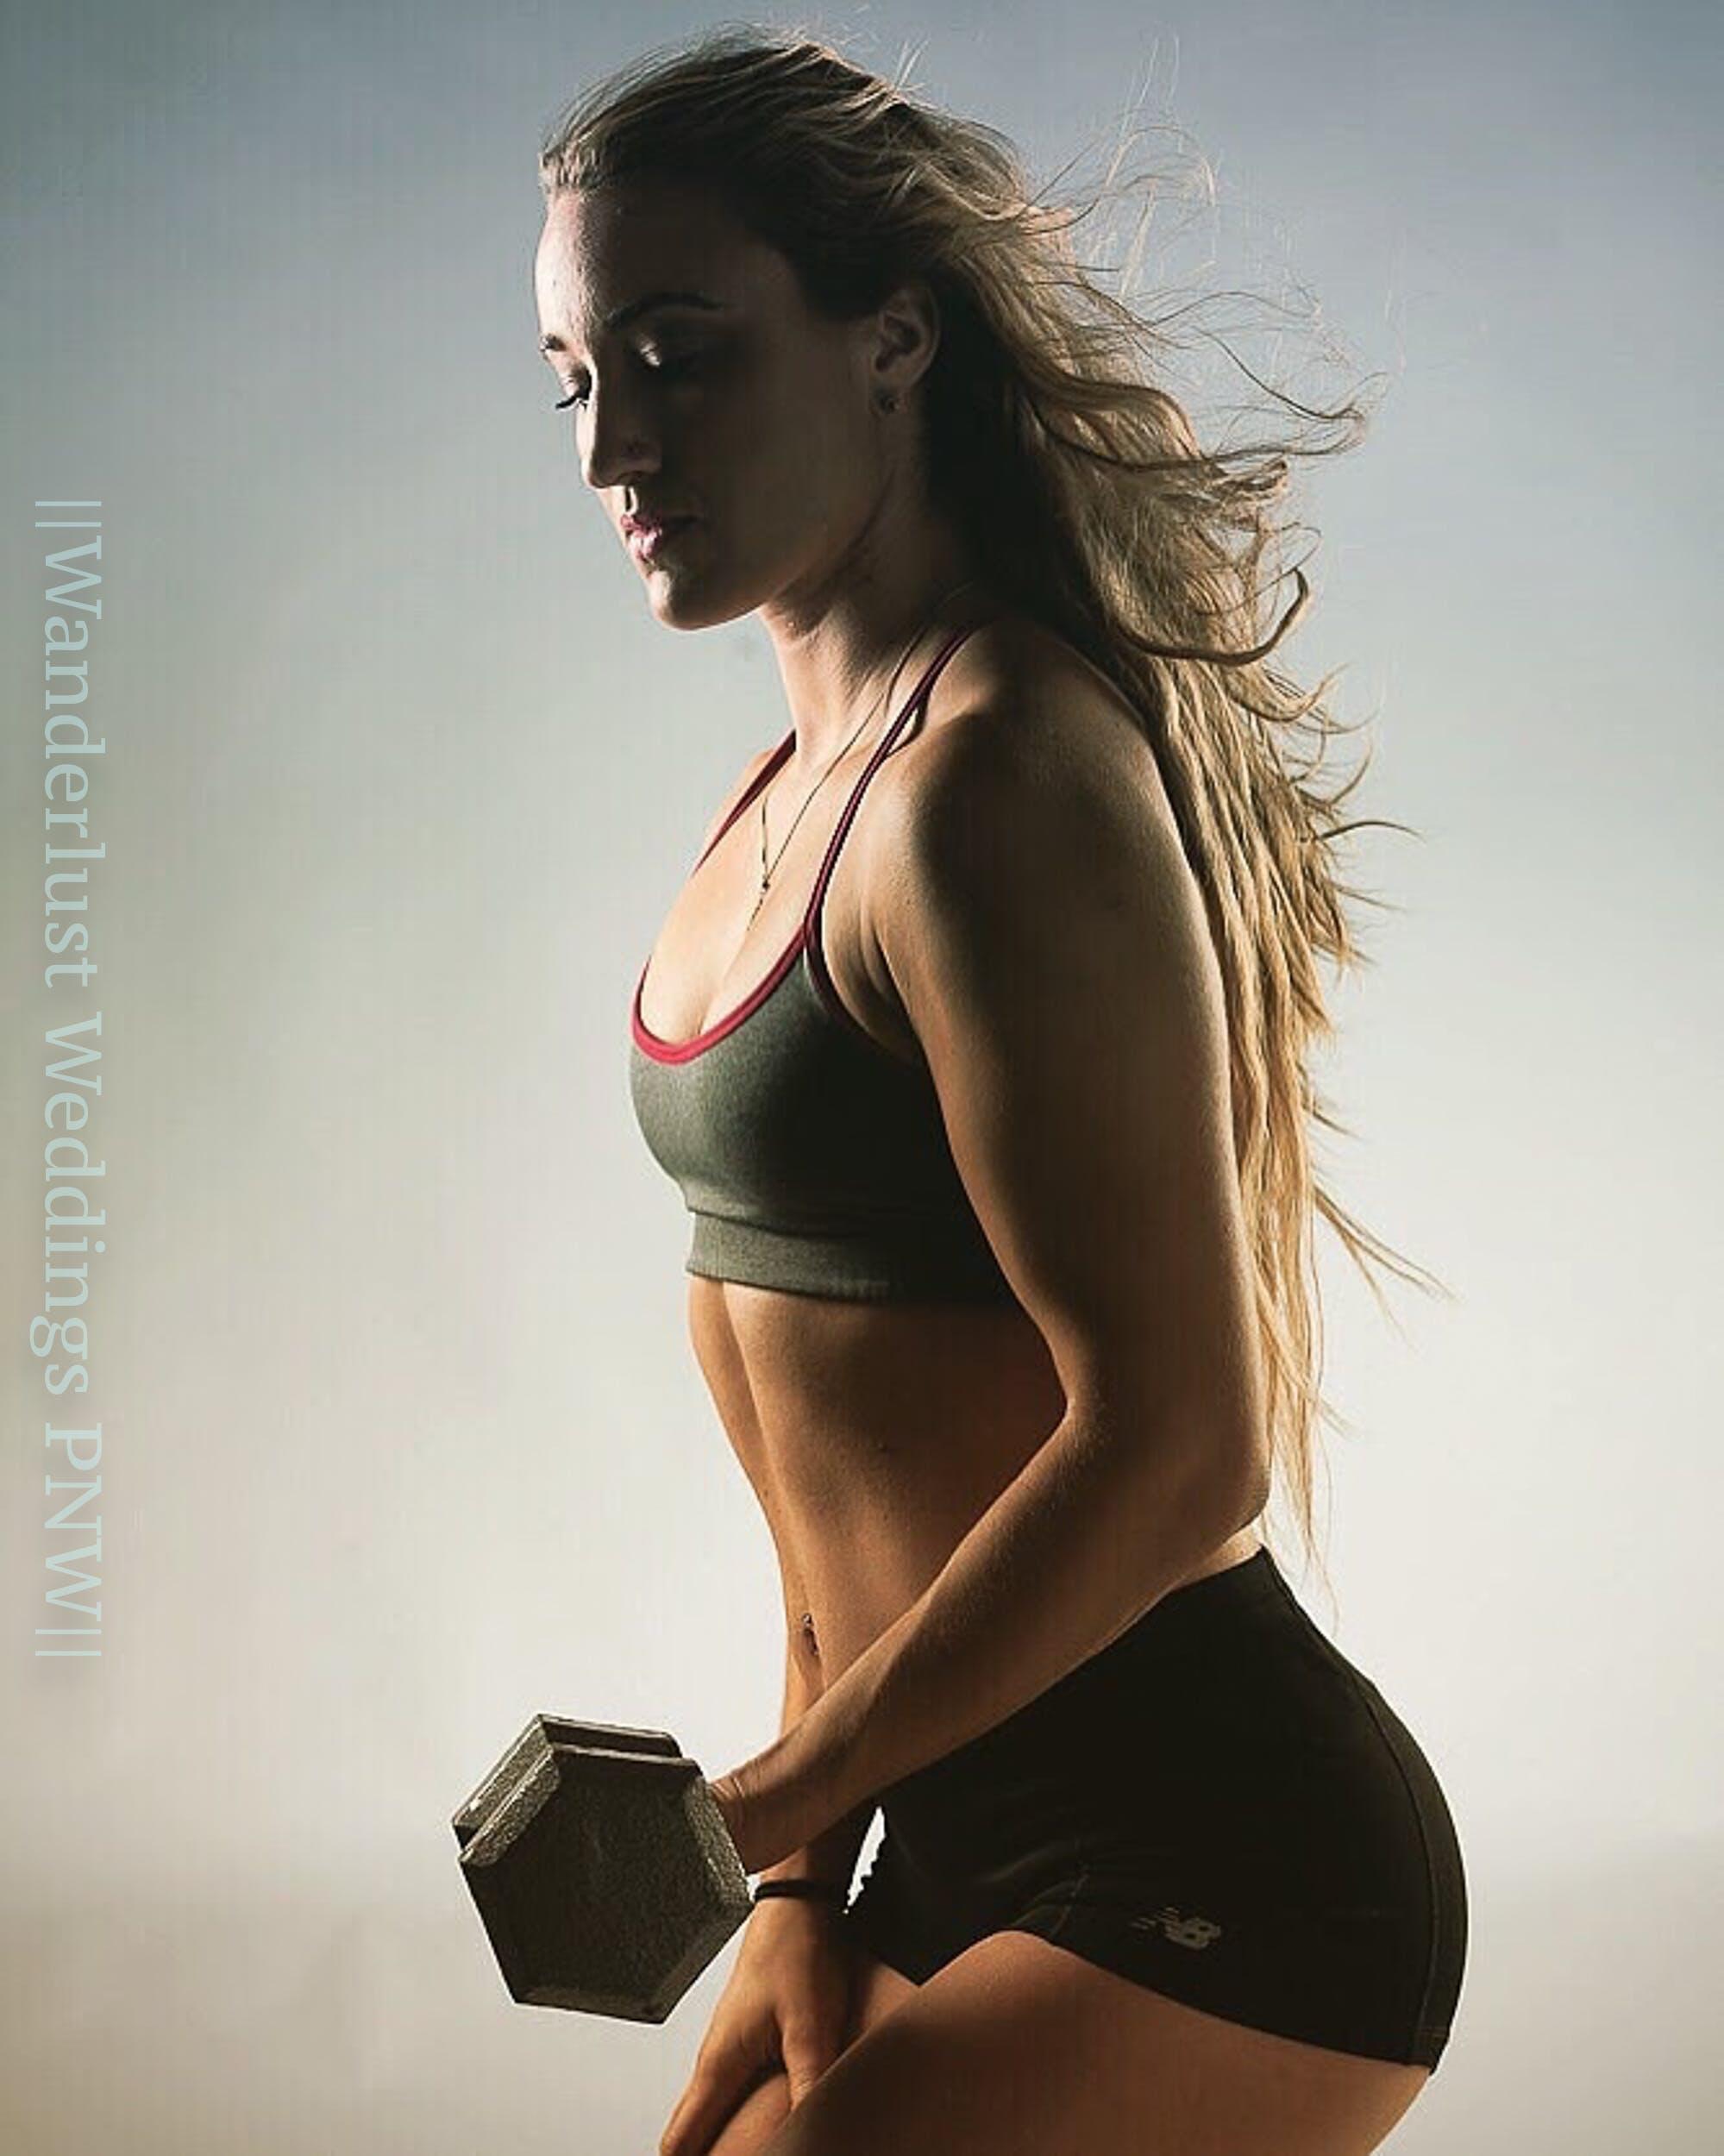 Free stock photo of althlete, arms, asian food, athlete